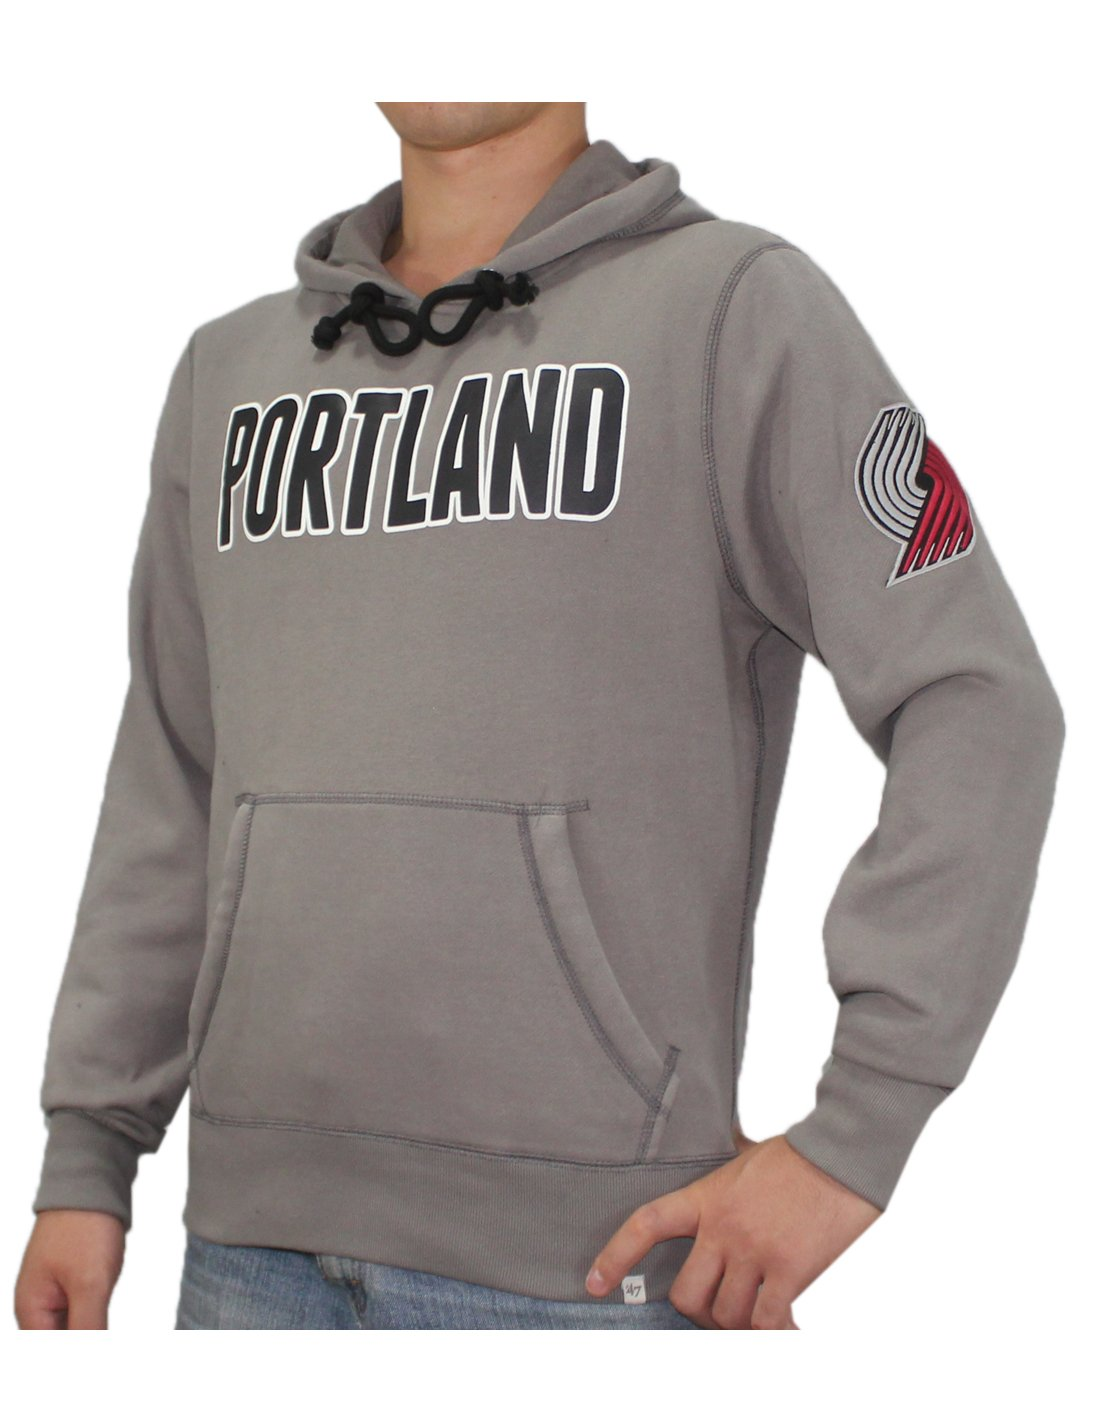 NBA Mens PORTLAND TRAIL BLAZERS: Athletic Pullover Hoodie / Sweatshirt S Grey by NBA